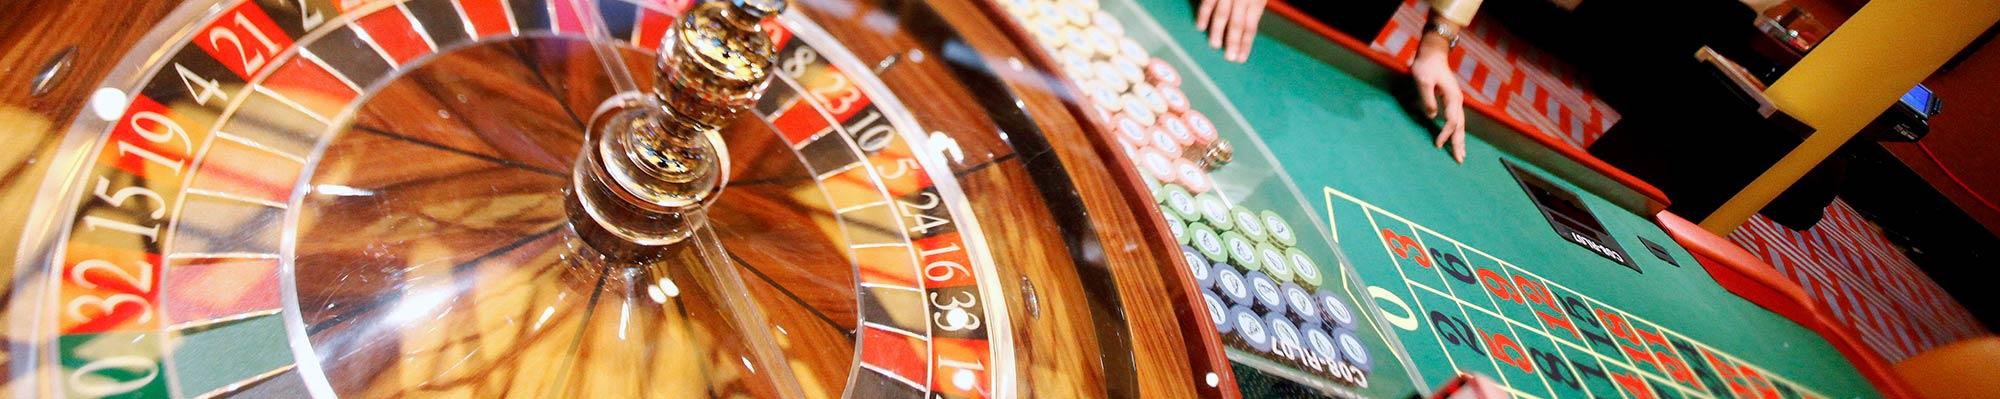 Casino equipment rentals montreal